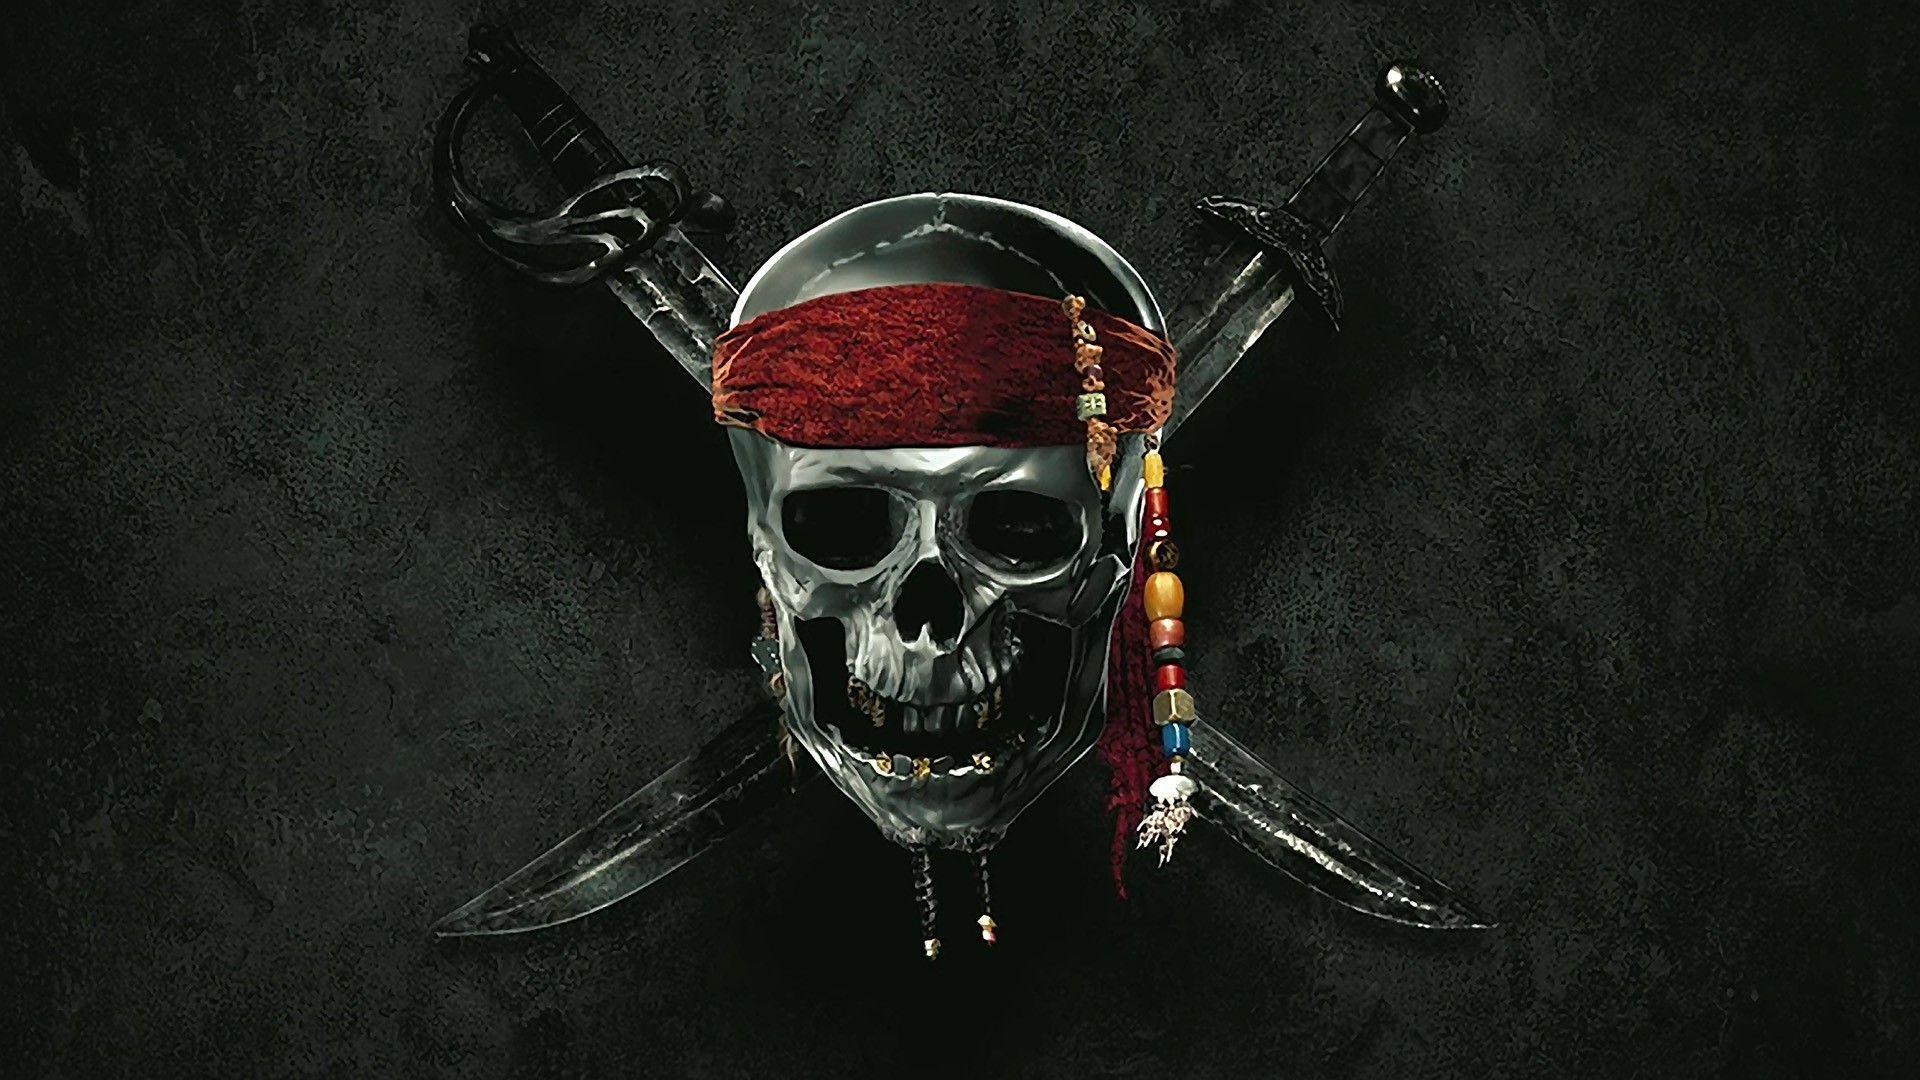 wallpaper skull bones pirate - photo #13